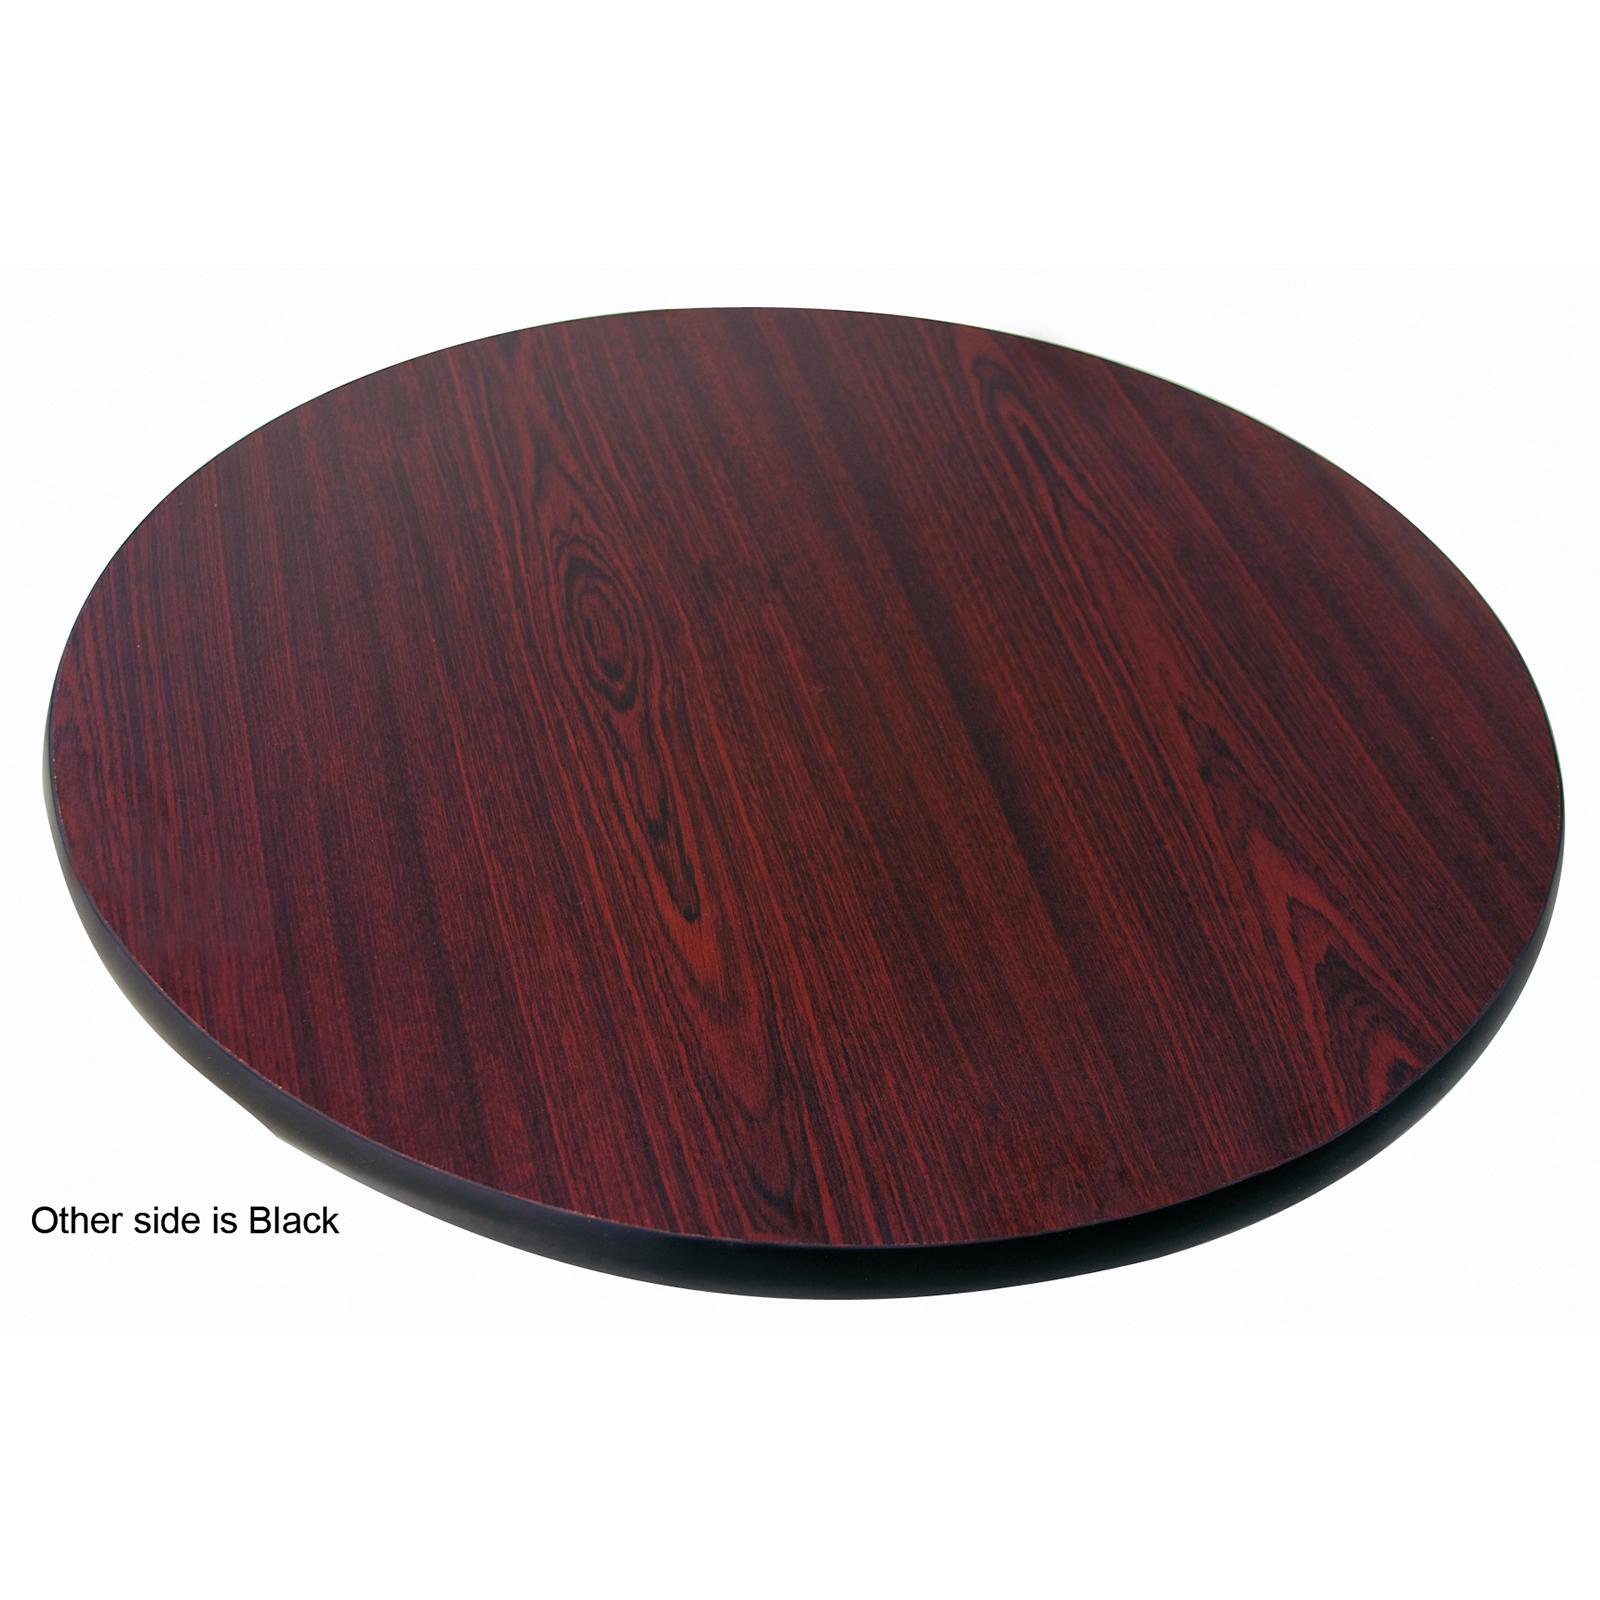 3109-47 Crown Brands, LLC 91212 table top, laminate